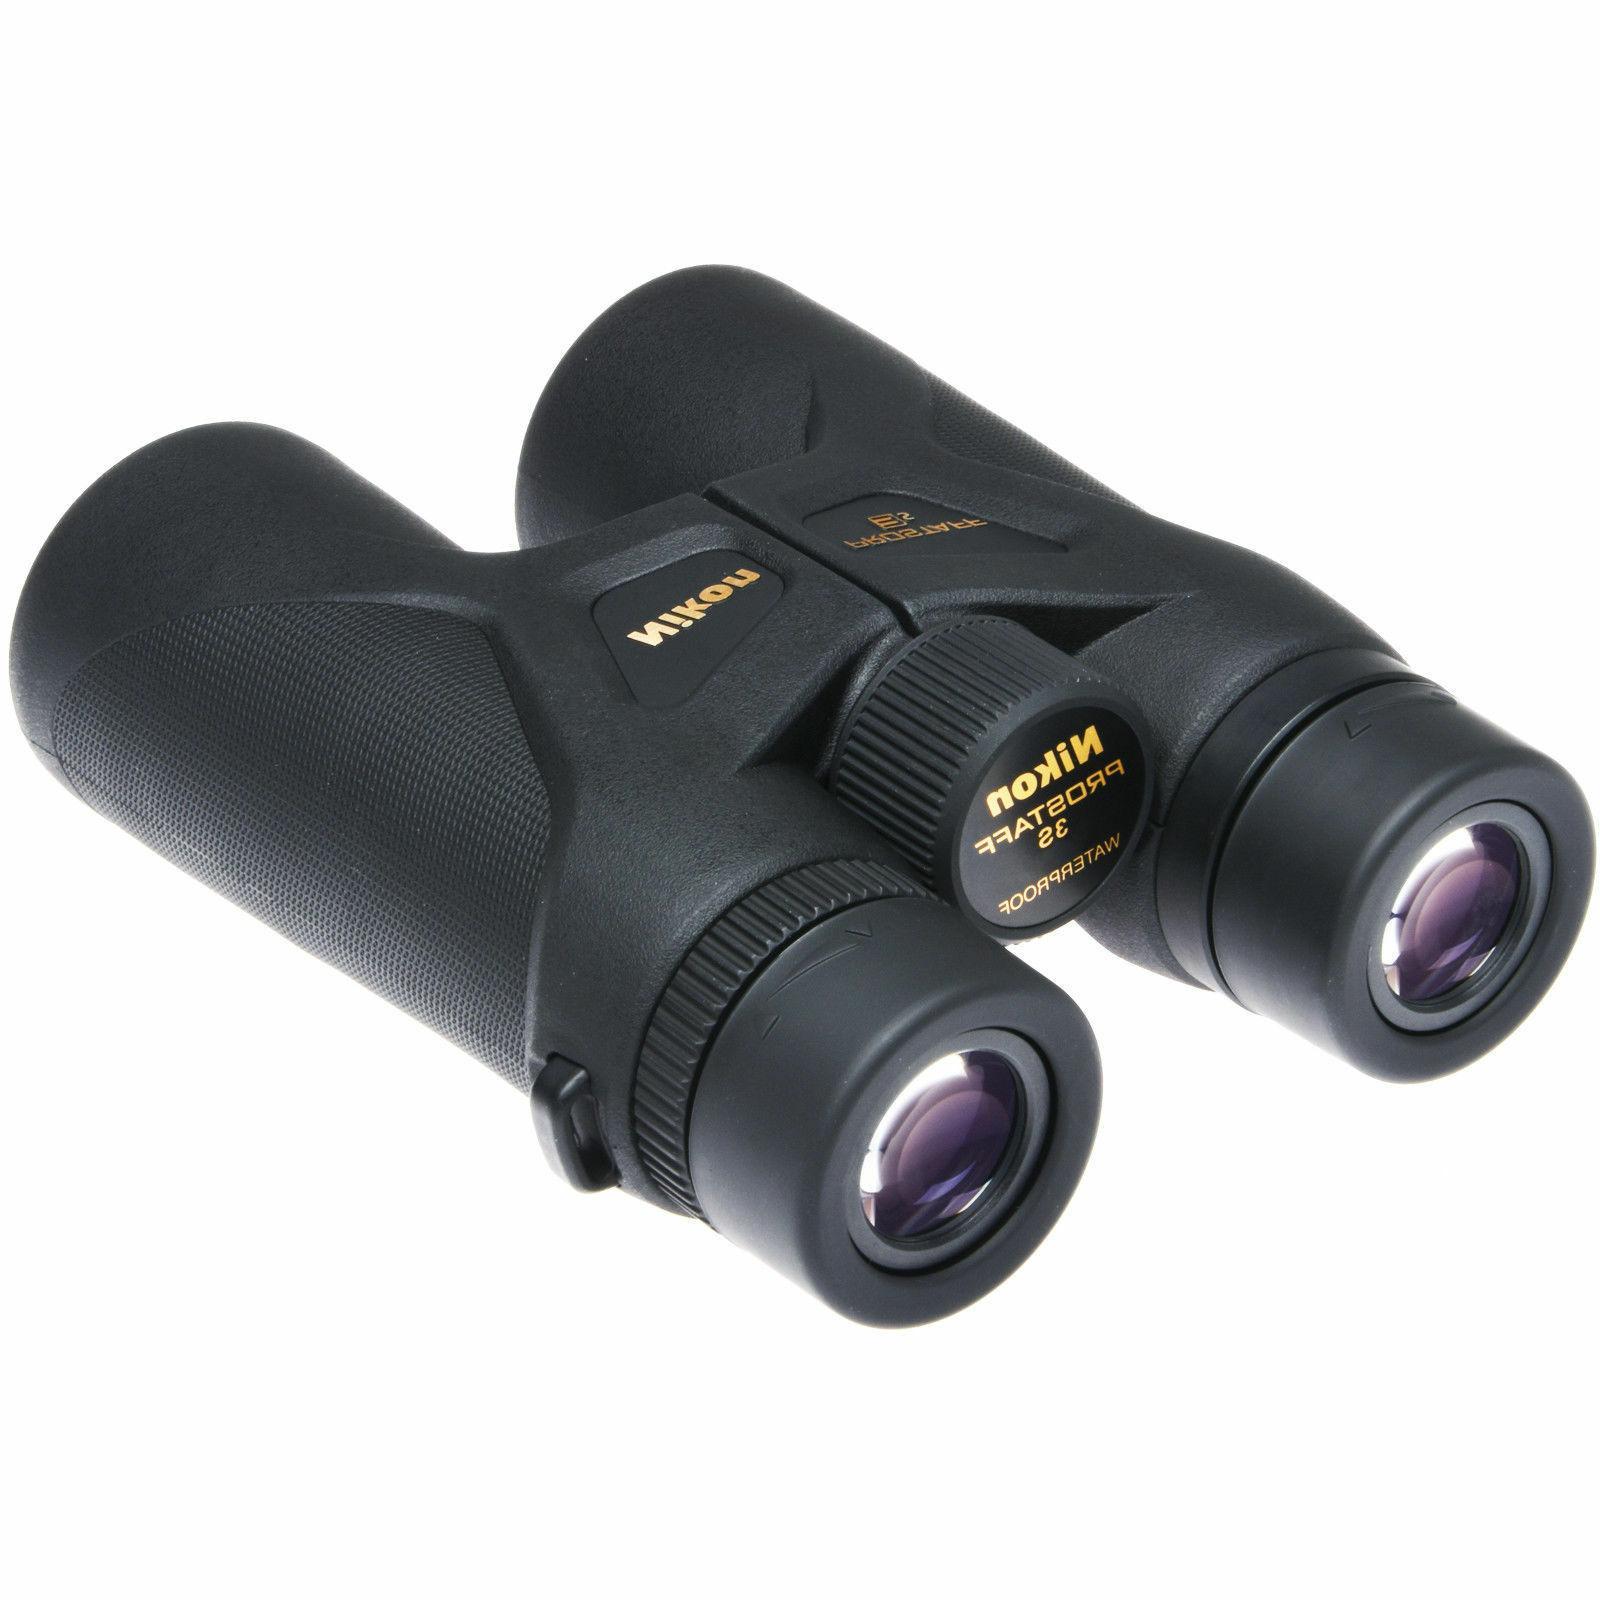 Nikon Prostaff 10x42 Waterproof / Binoculars with